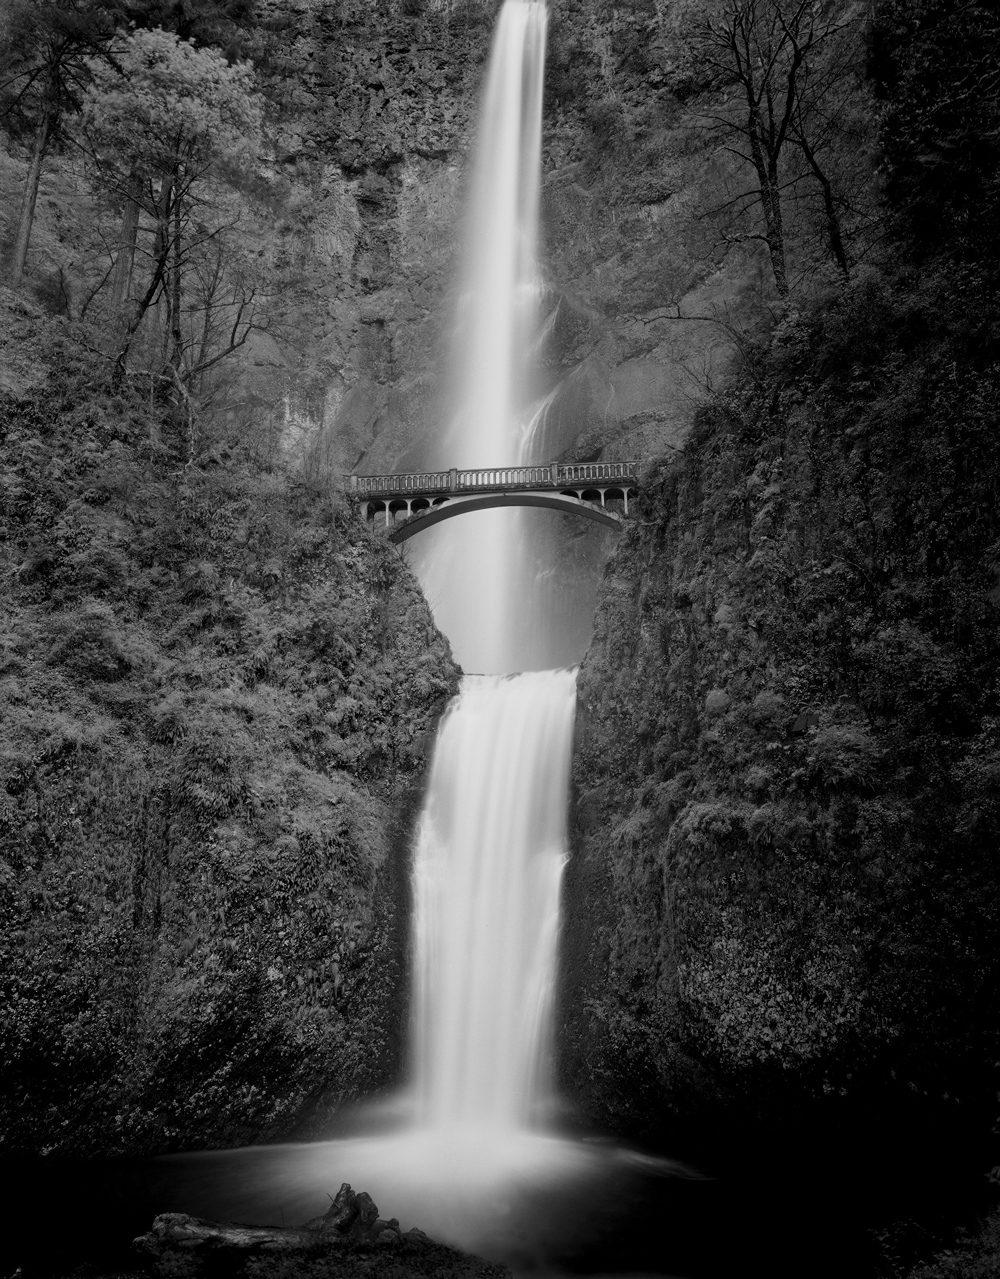 Multnomah-Falls-8x10-Ilford-HP5-Plus